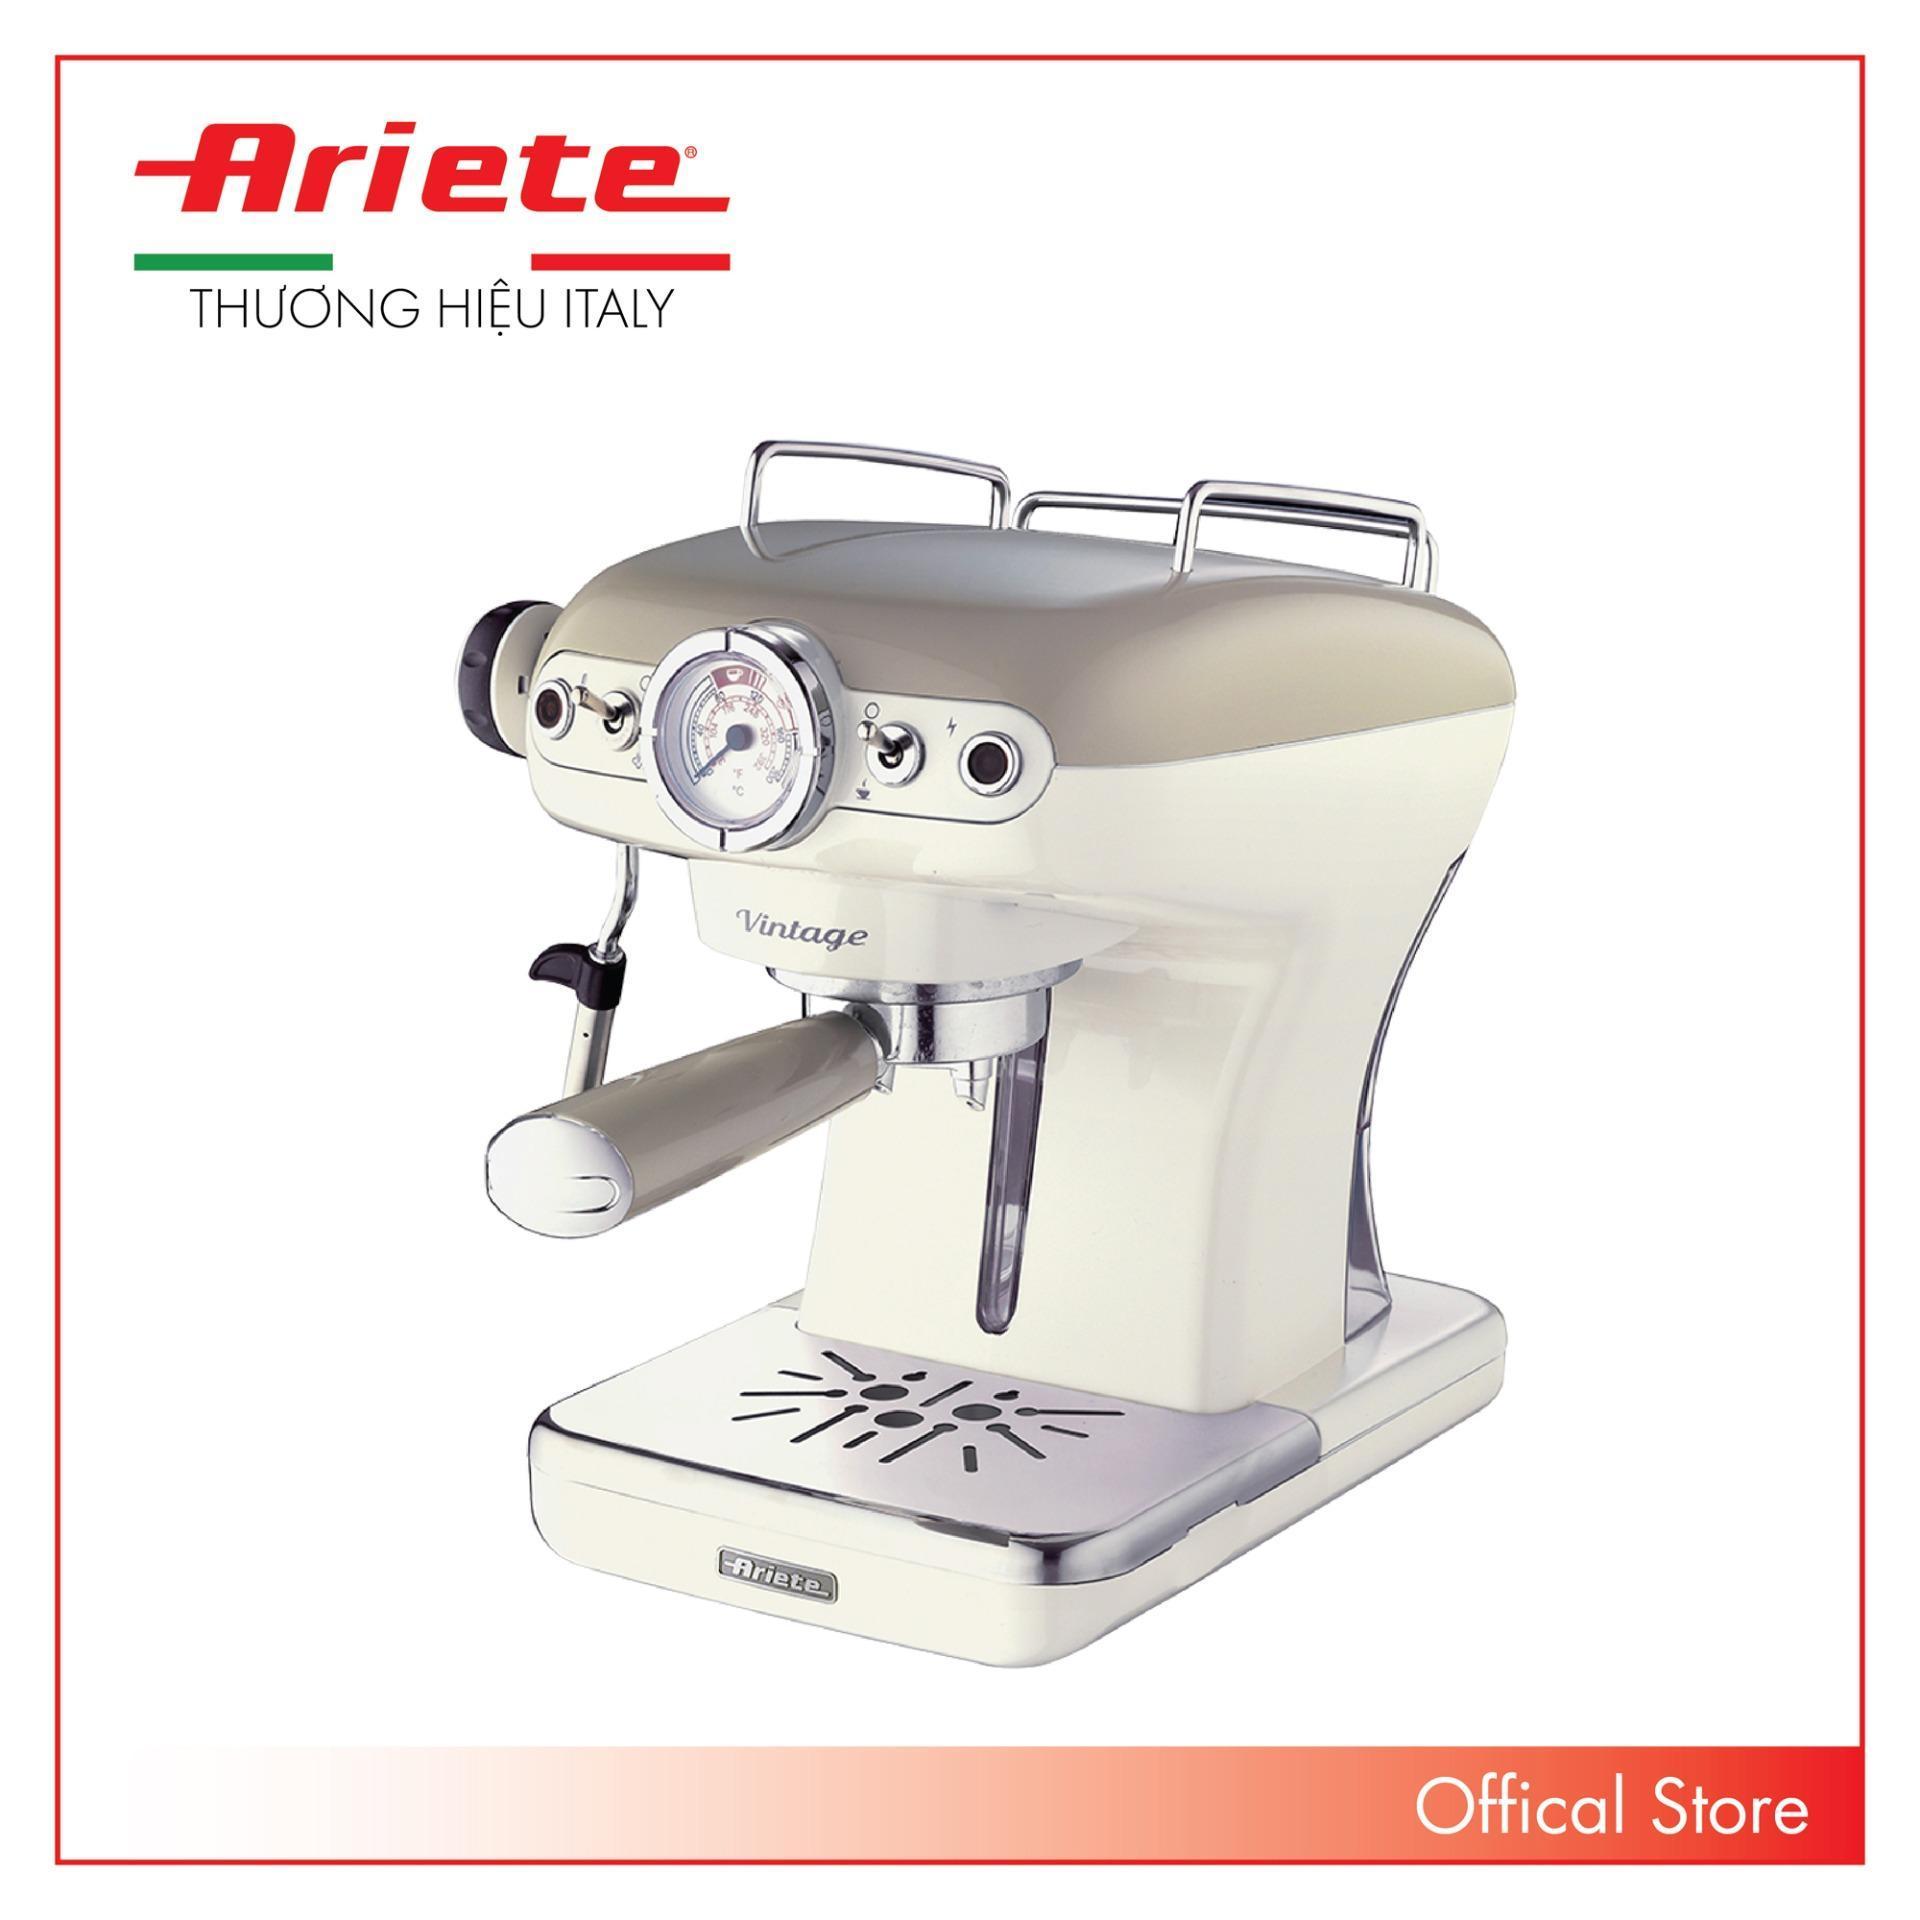 Máy pha cà phê 0,9 lít Ariete MOD. 1389/13 Kem